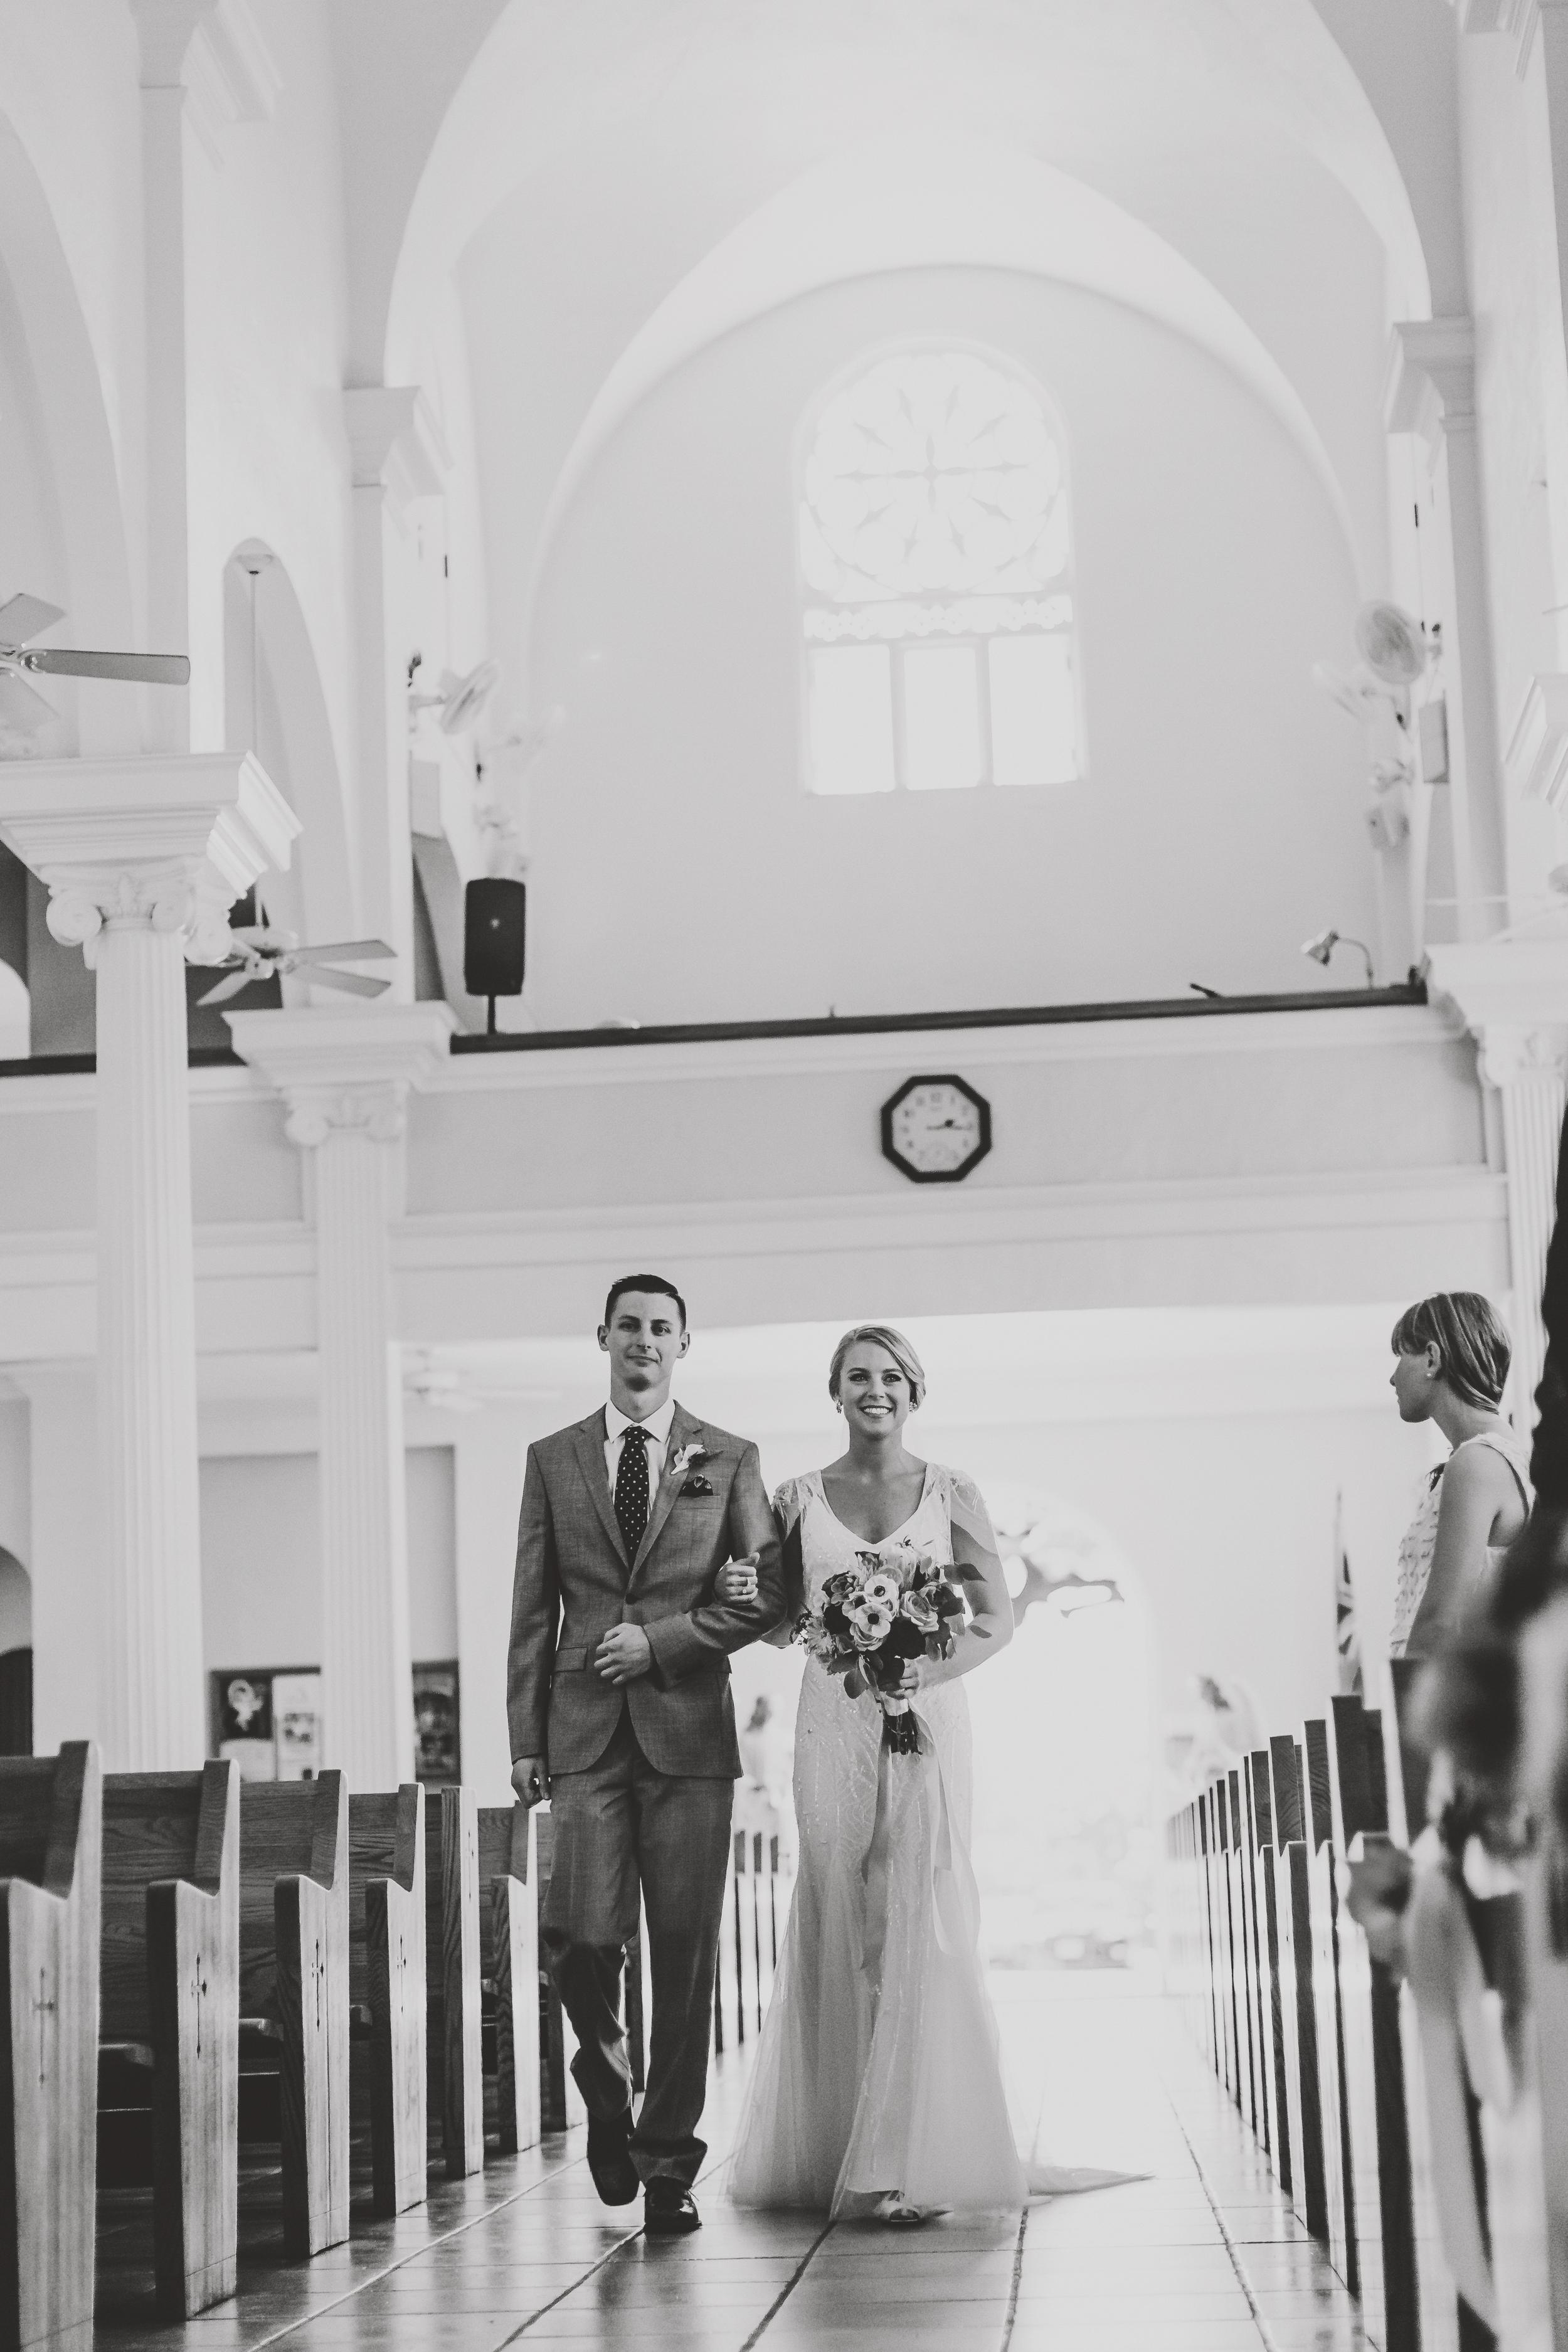 angie-diaz-photography-maui-wedding-mel-matt-29.jpeg